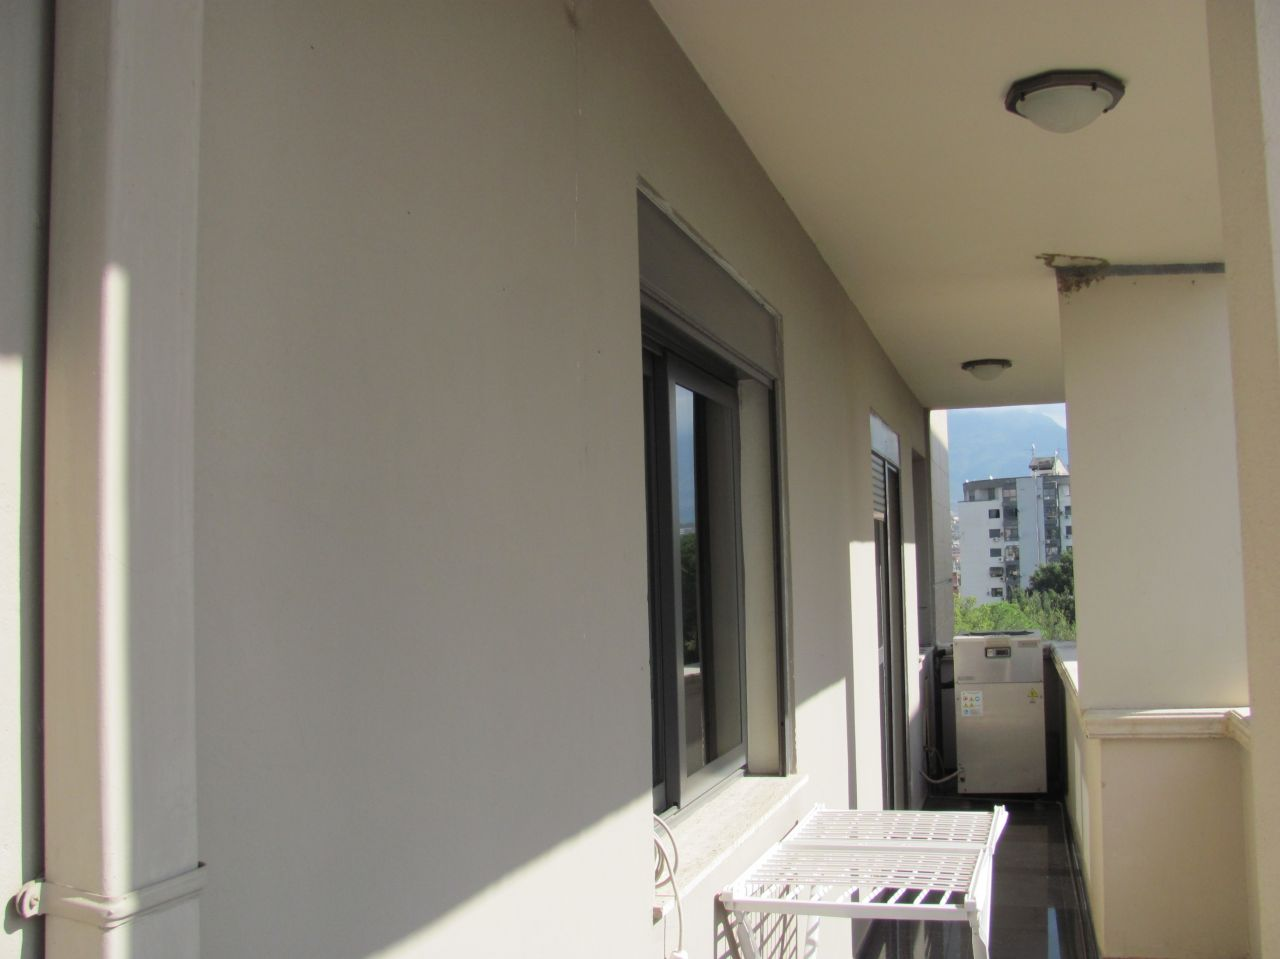 7 Rruga Faik Konica, Tirane 1015